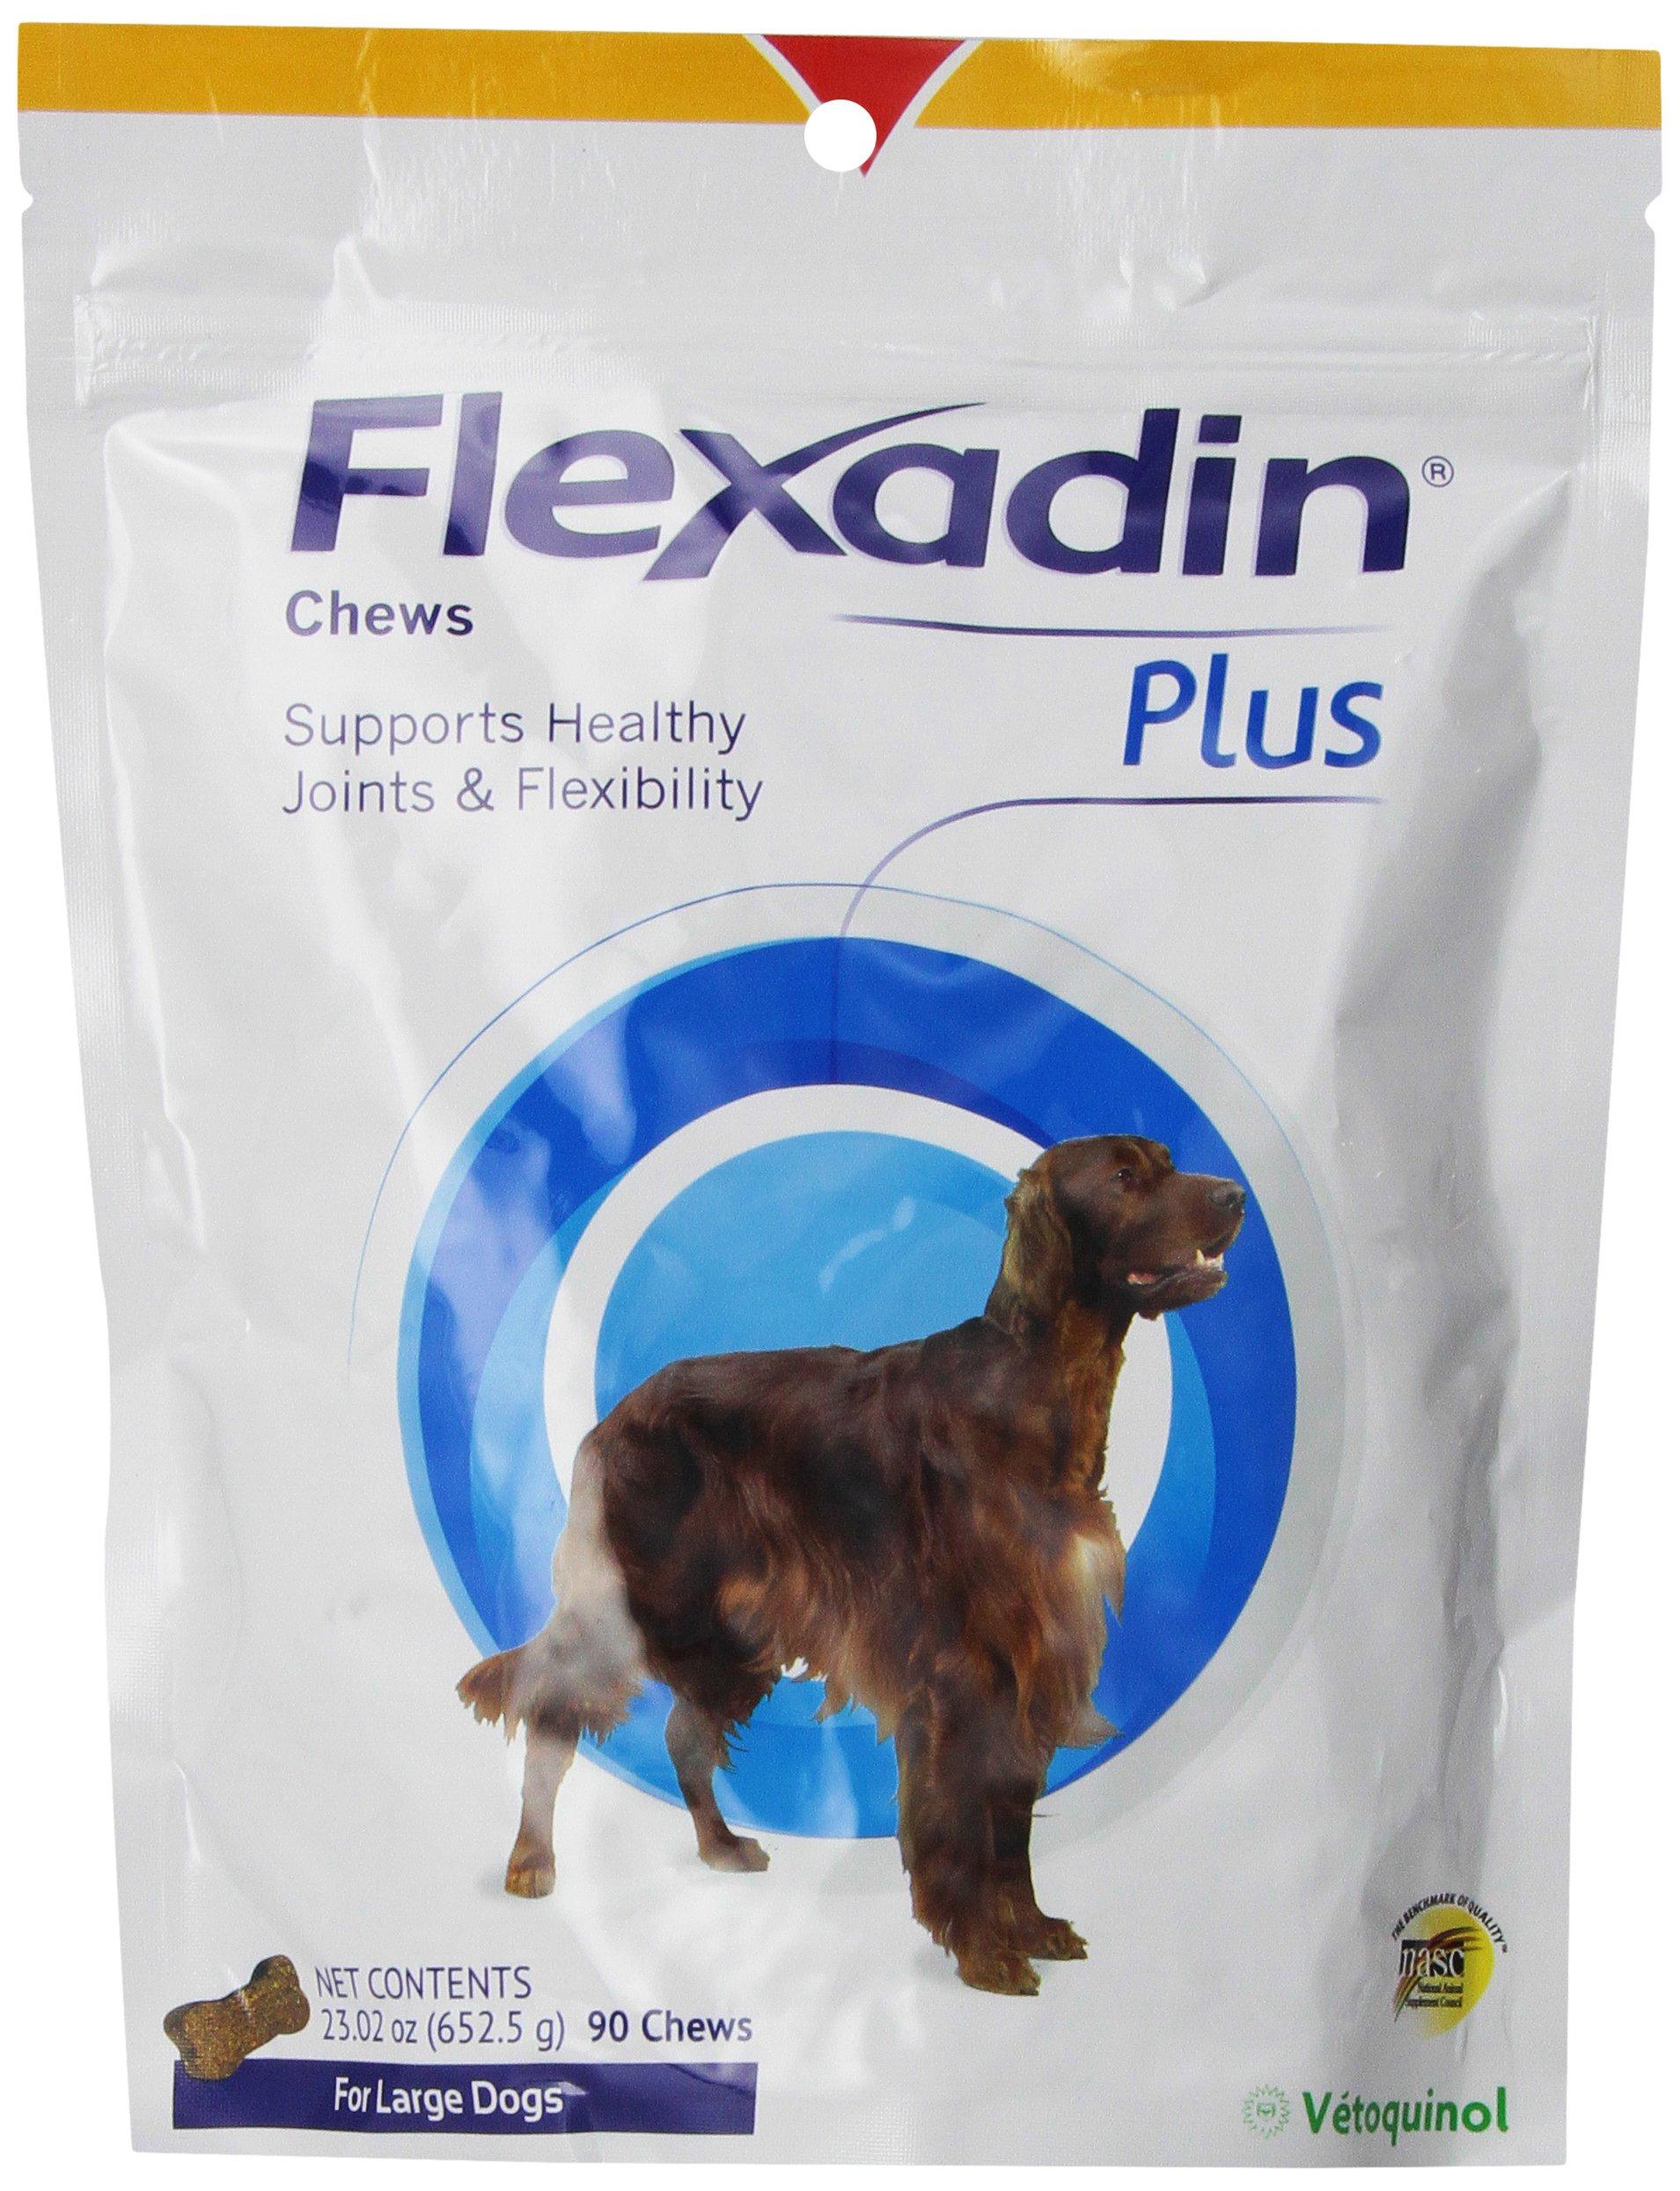 VETOQUINOL Flexadin Plus Chews for Large Dogs, 90 Chews 23.02 oz.